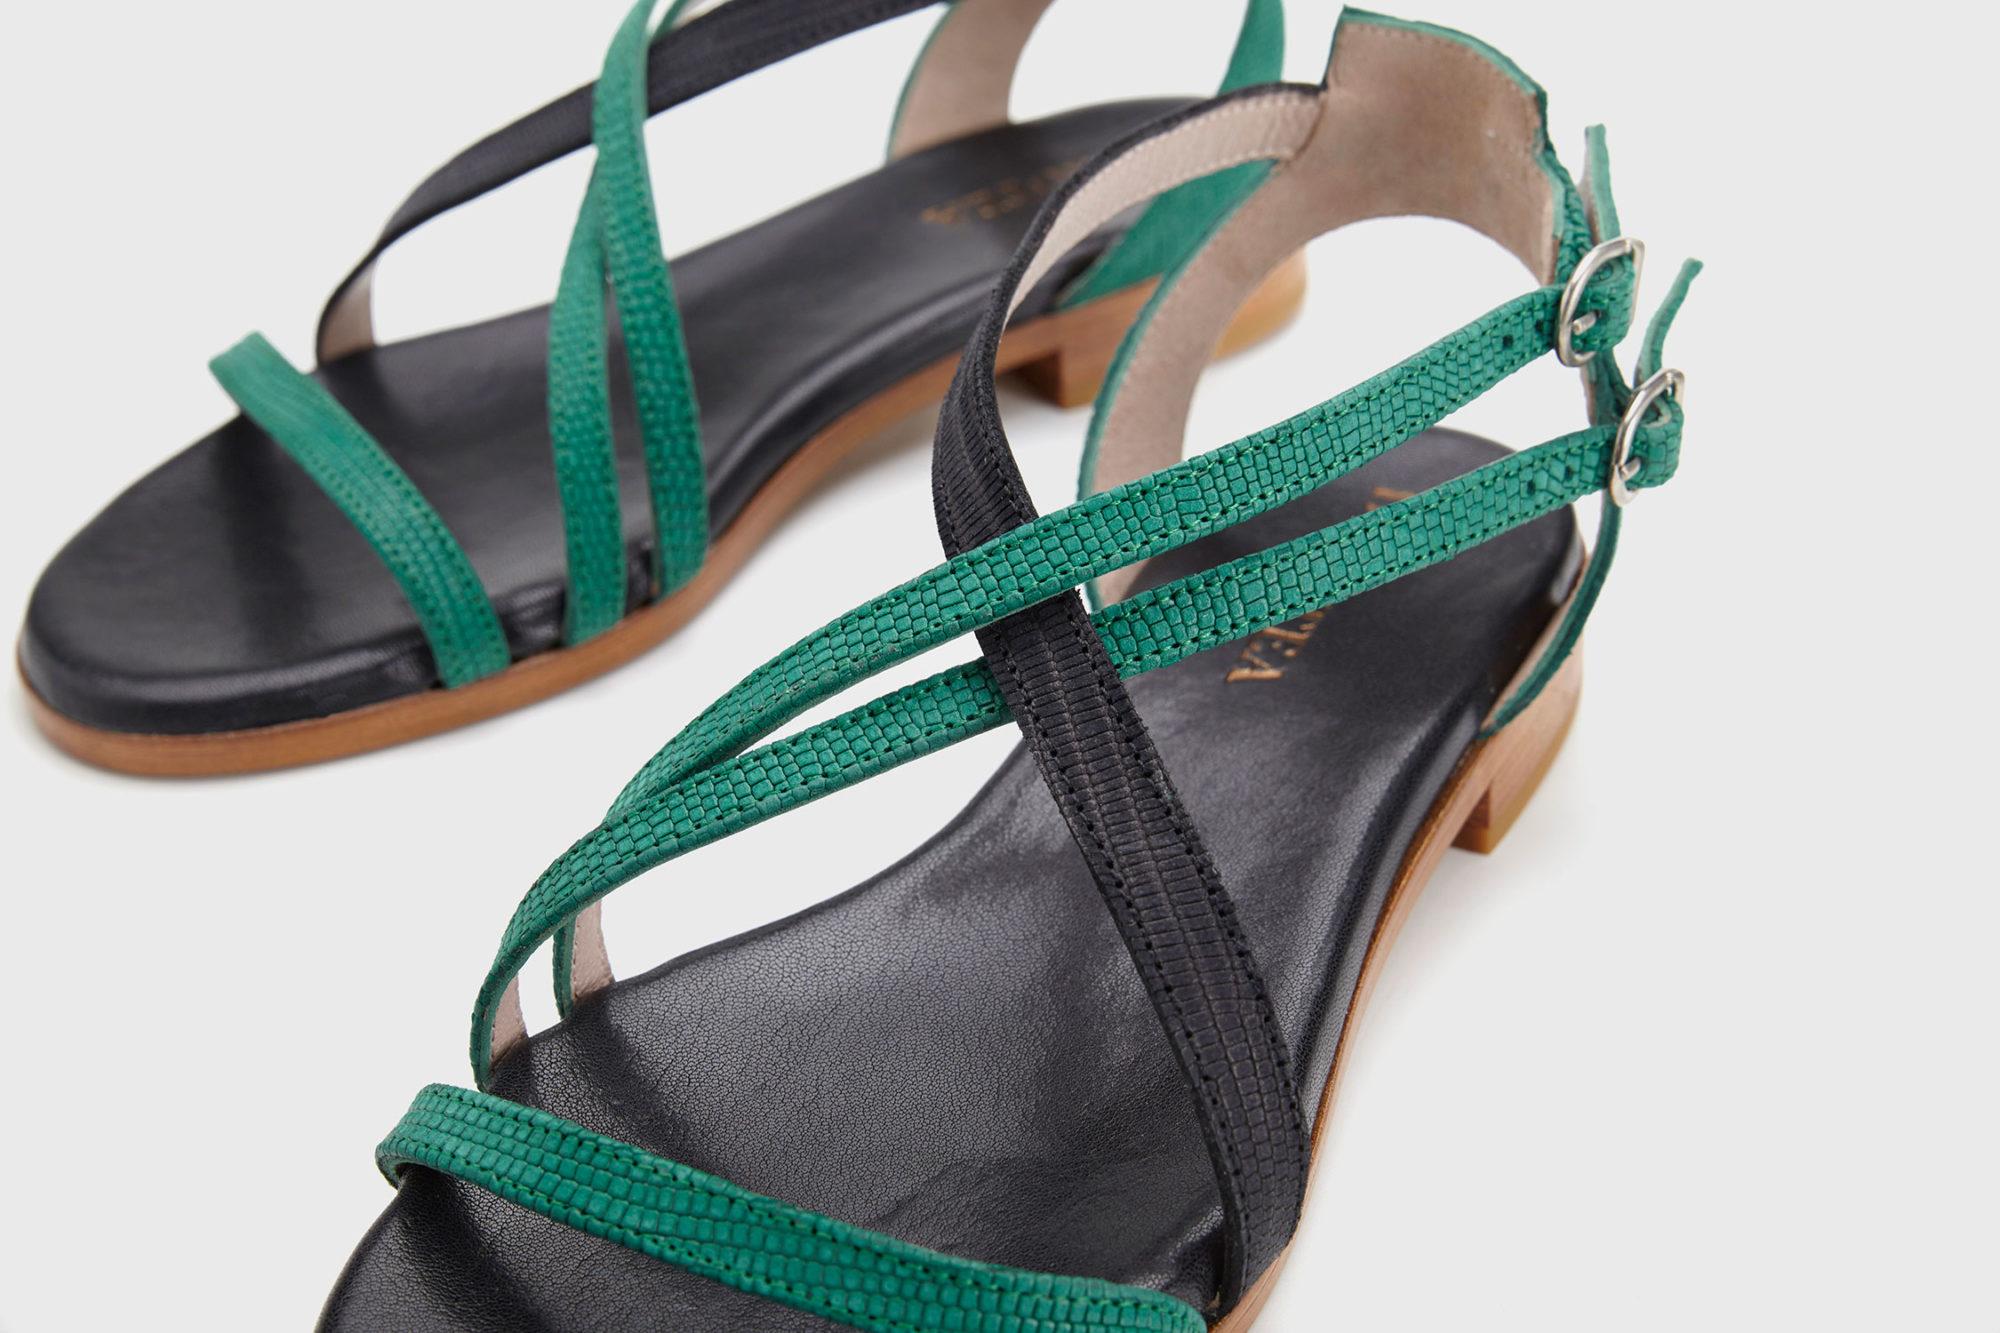 Dorotea sandalia plana Charlotte verde esmeralda ss17 detalle